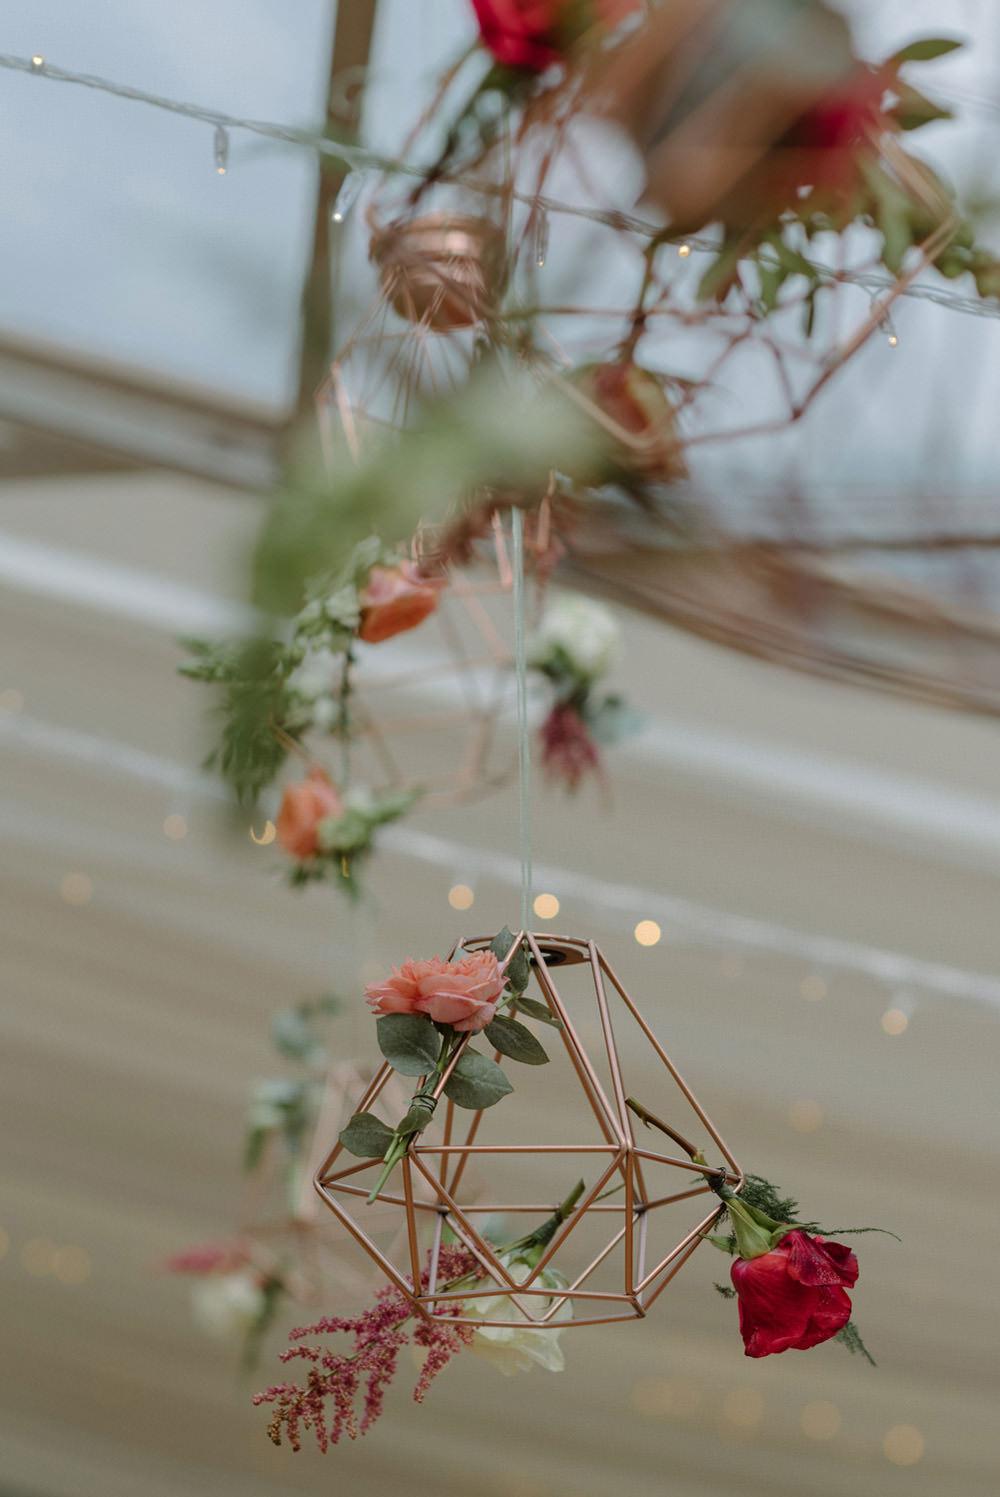 Geometric Hanging Floral Felin Newydd House Wedding Christopherian.co.uk